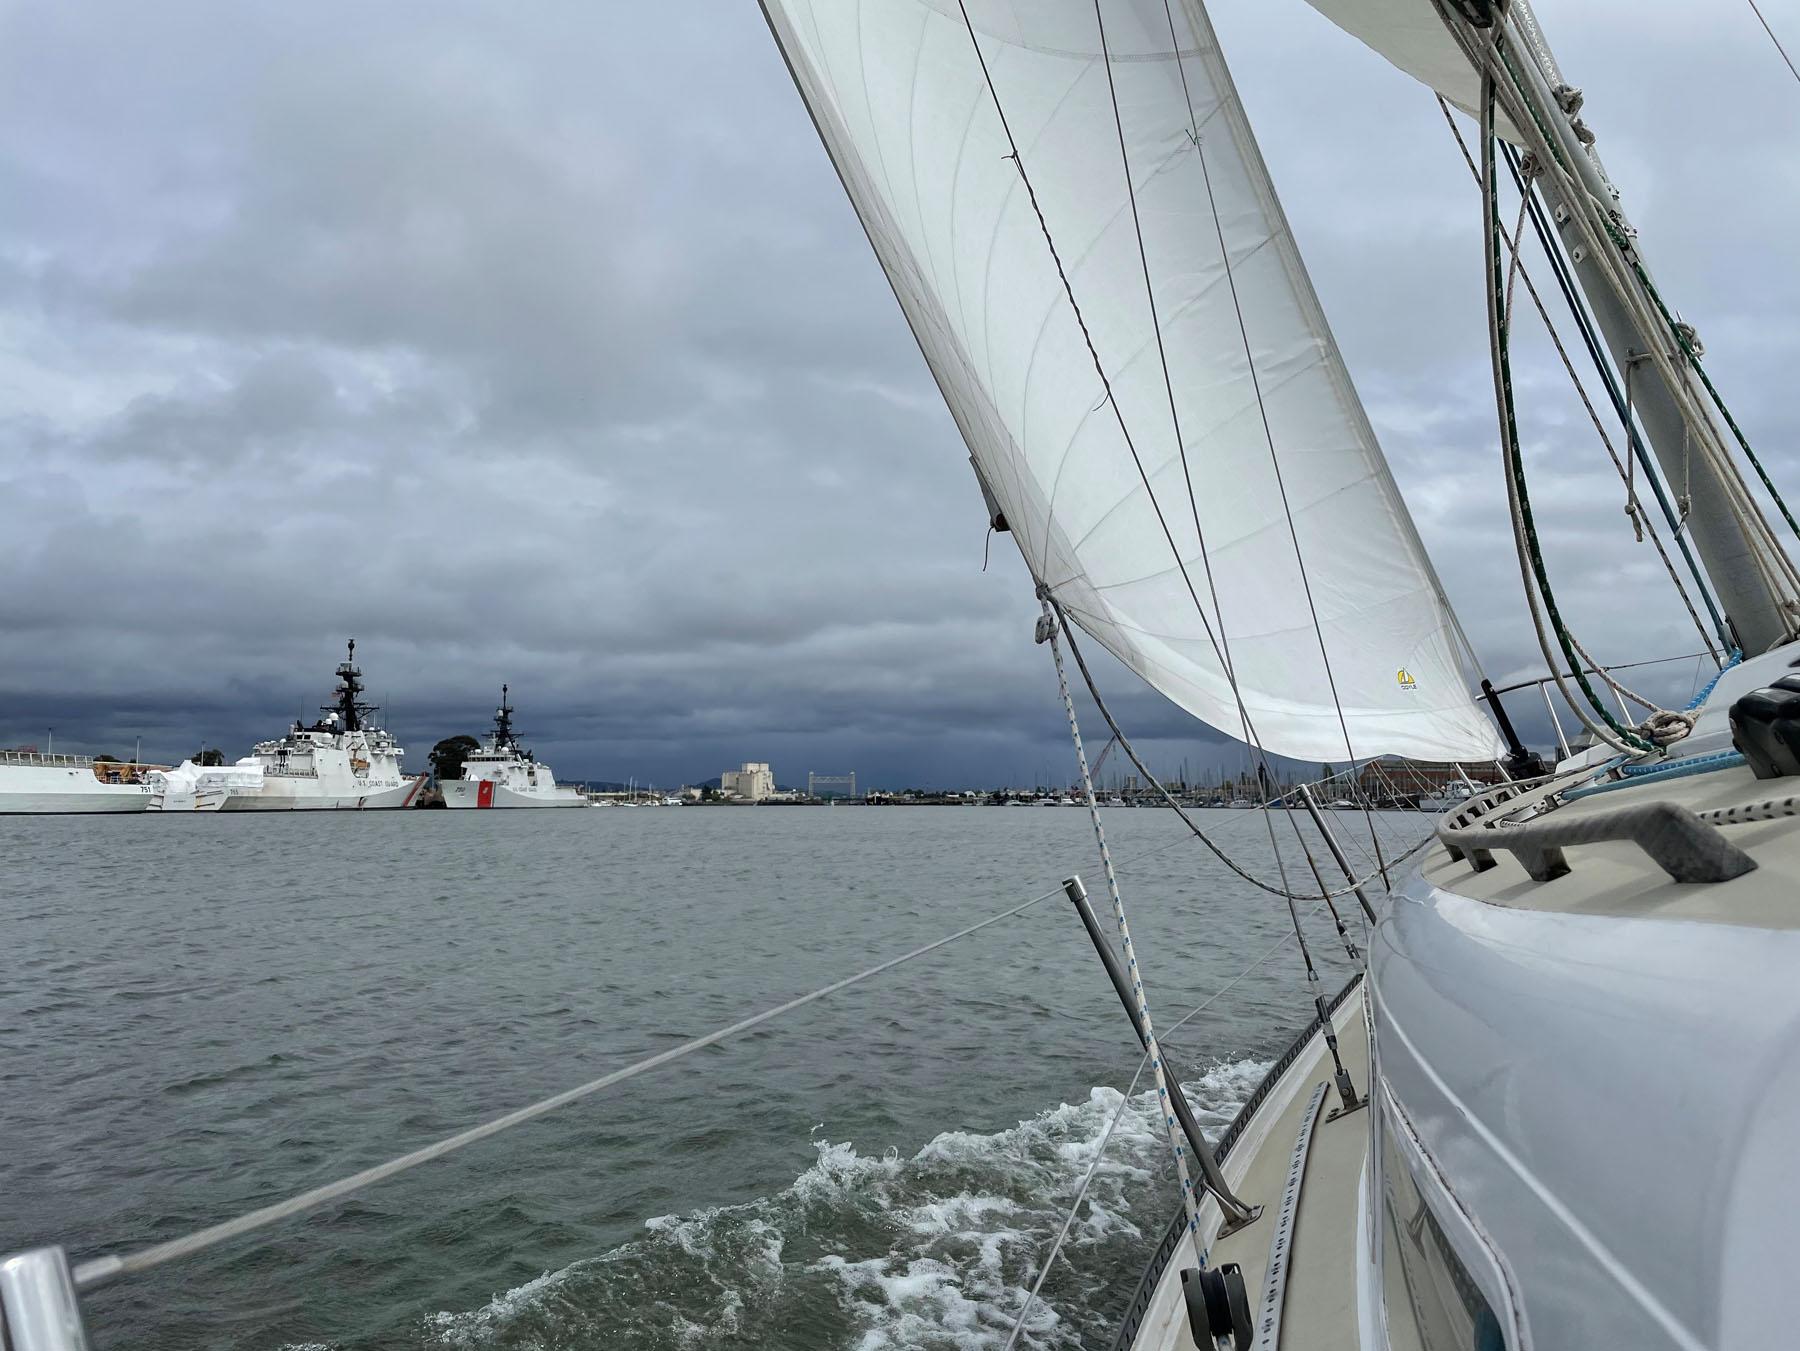 Summer Sailstice home to Alameda Marina